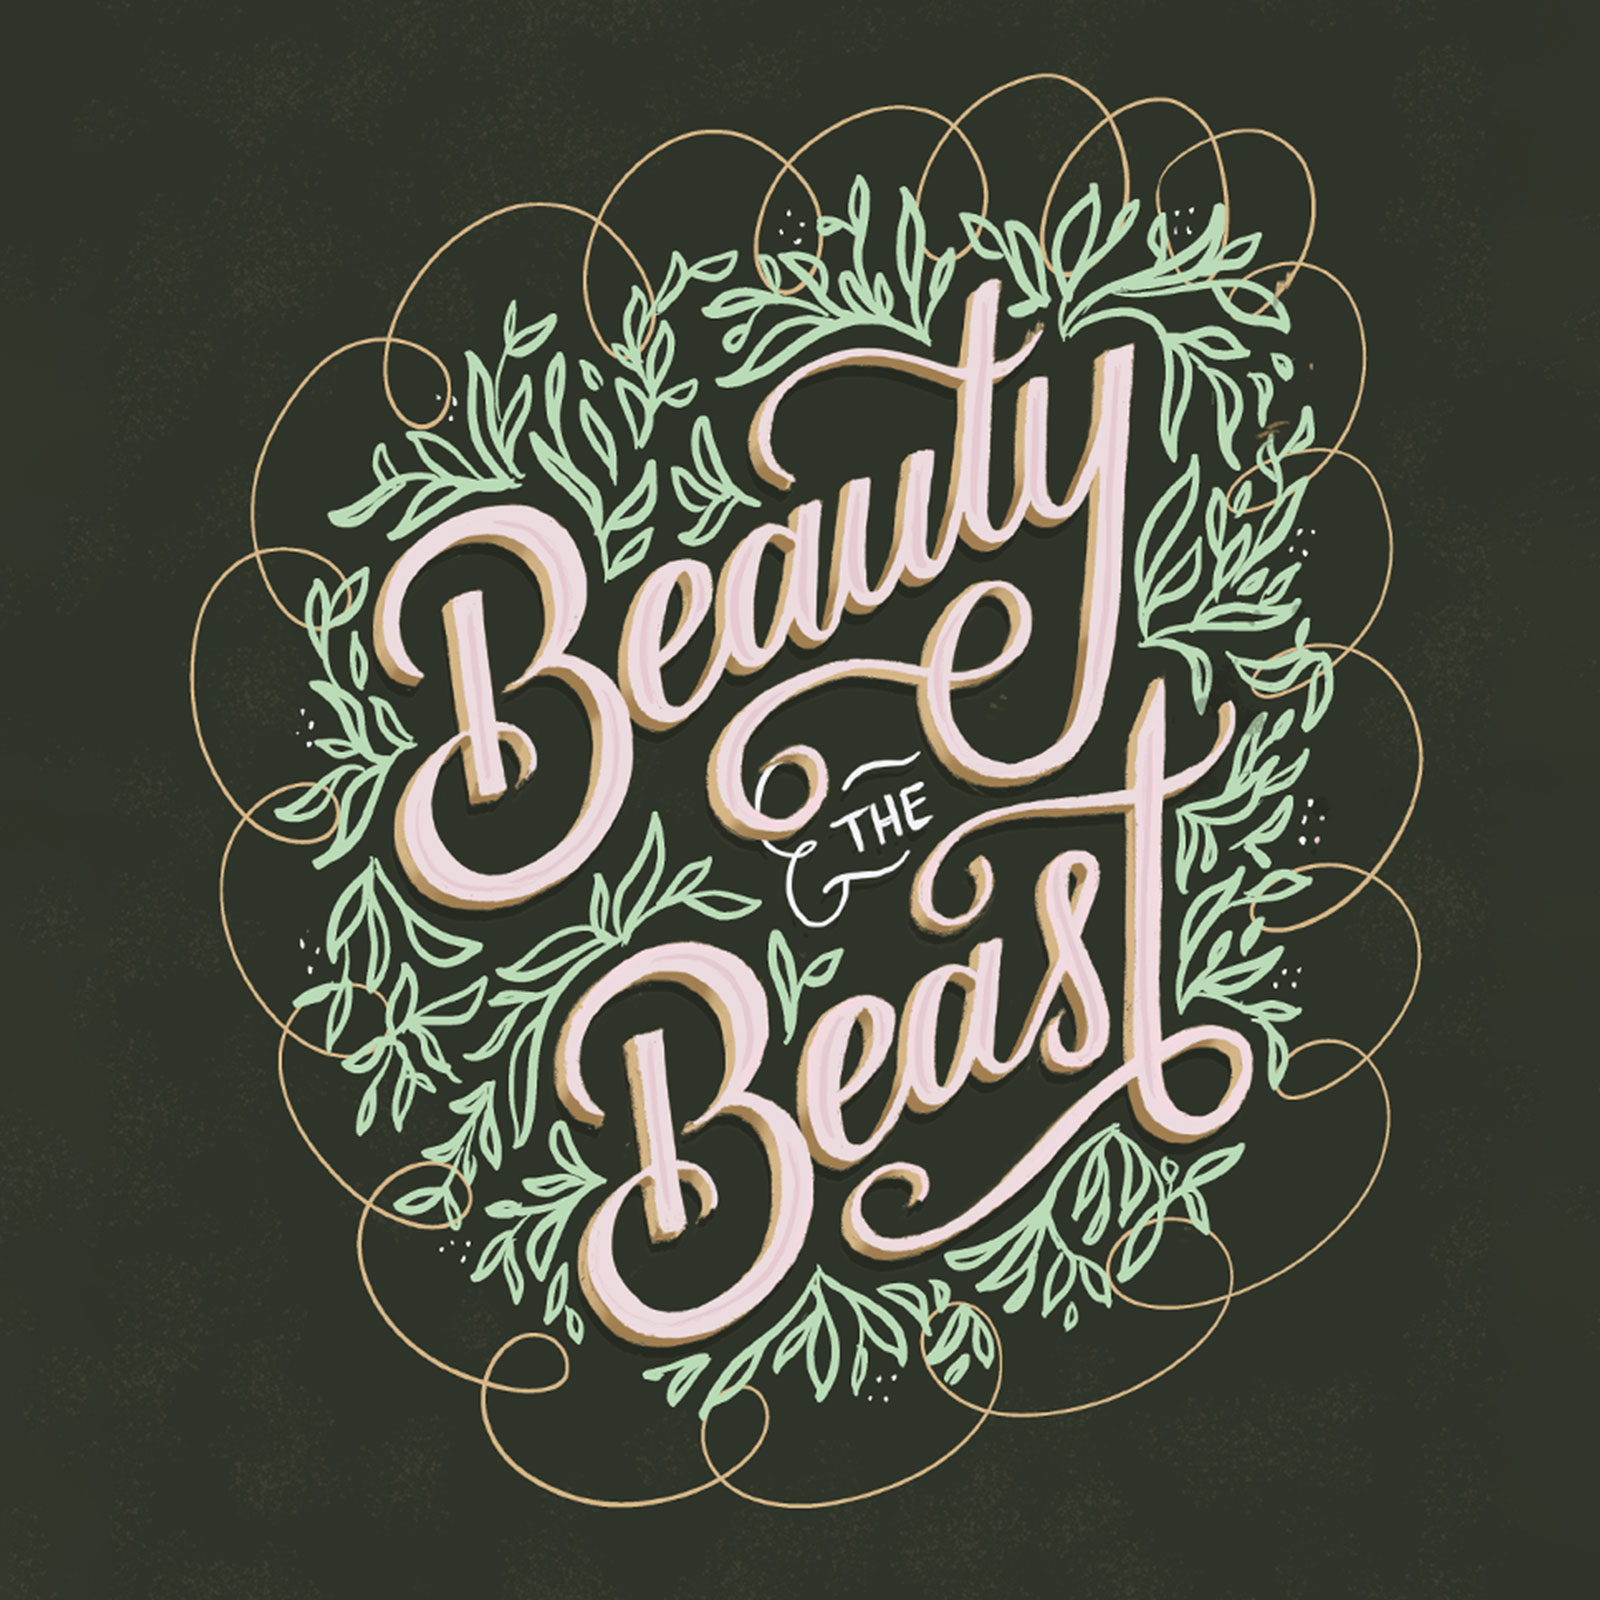 Beauty And The Beast - Helena Olson